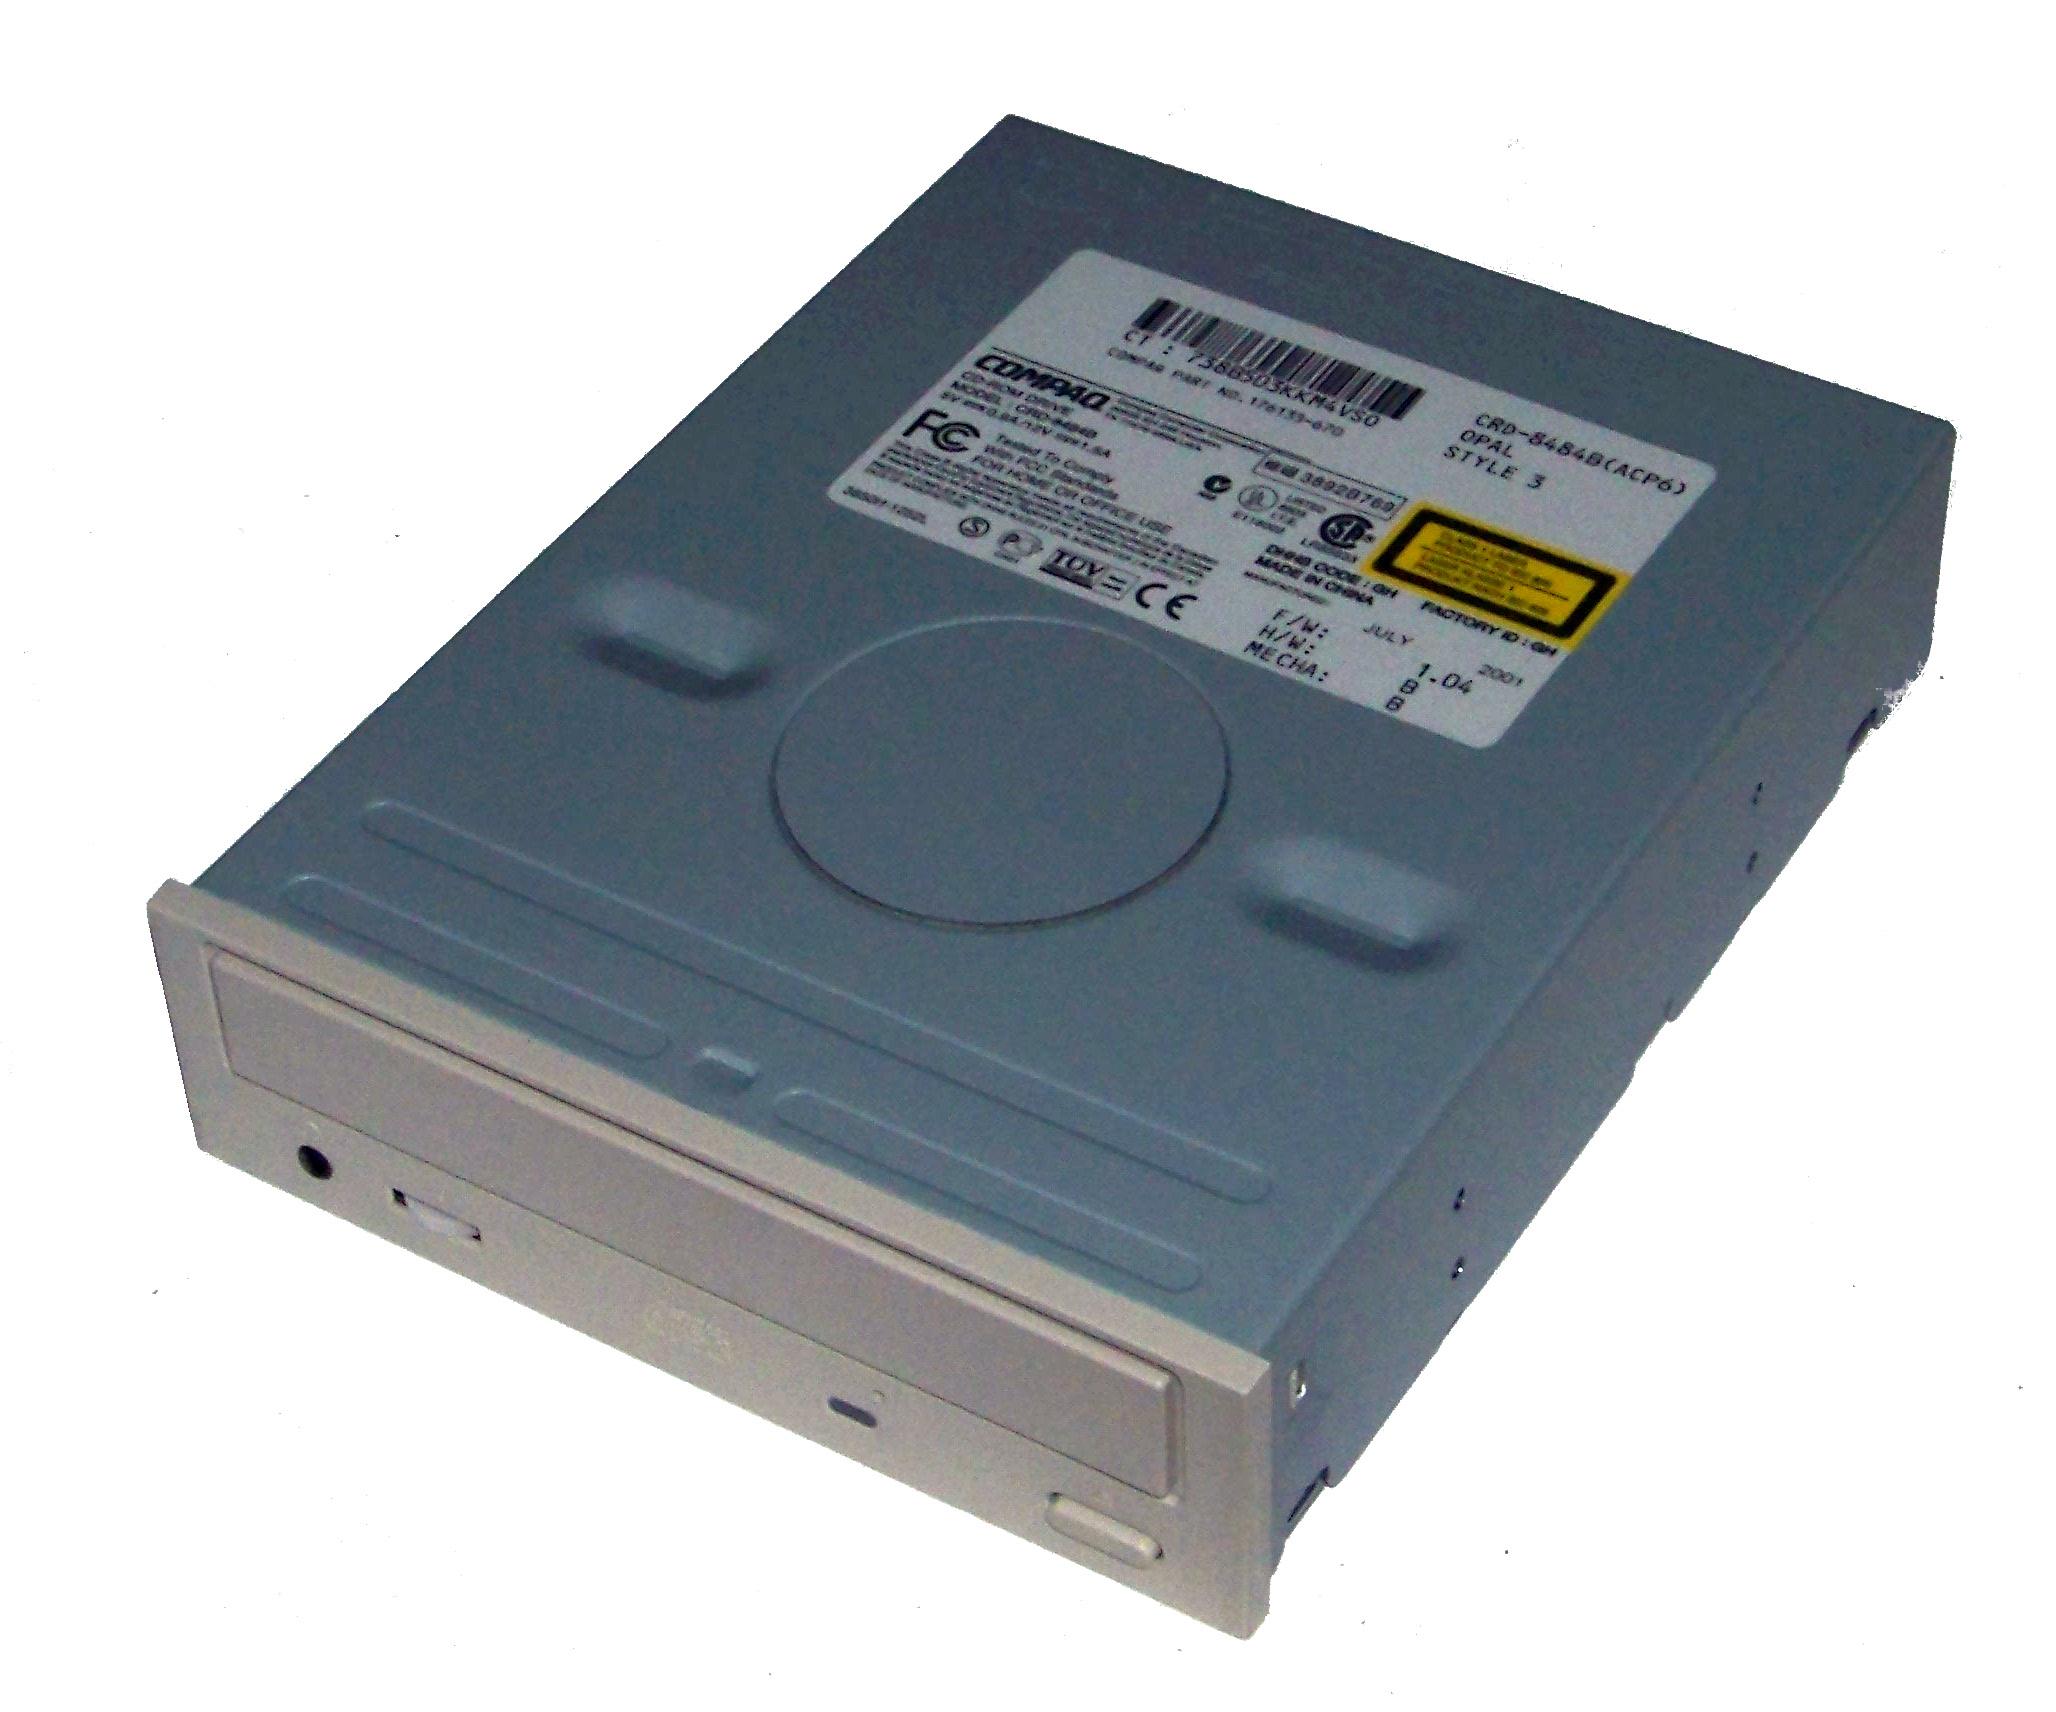 CD ROM CRD 8484B WINDOWS 8.1 DRIVER DOWNLOAD